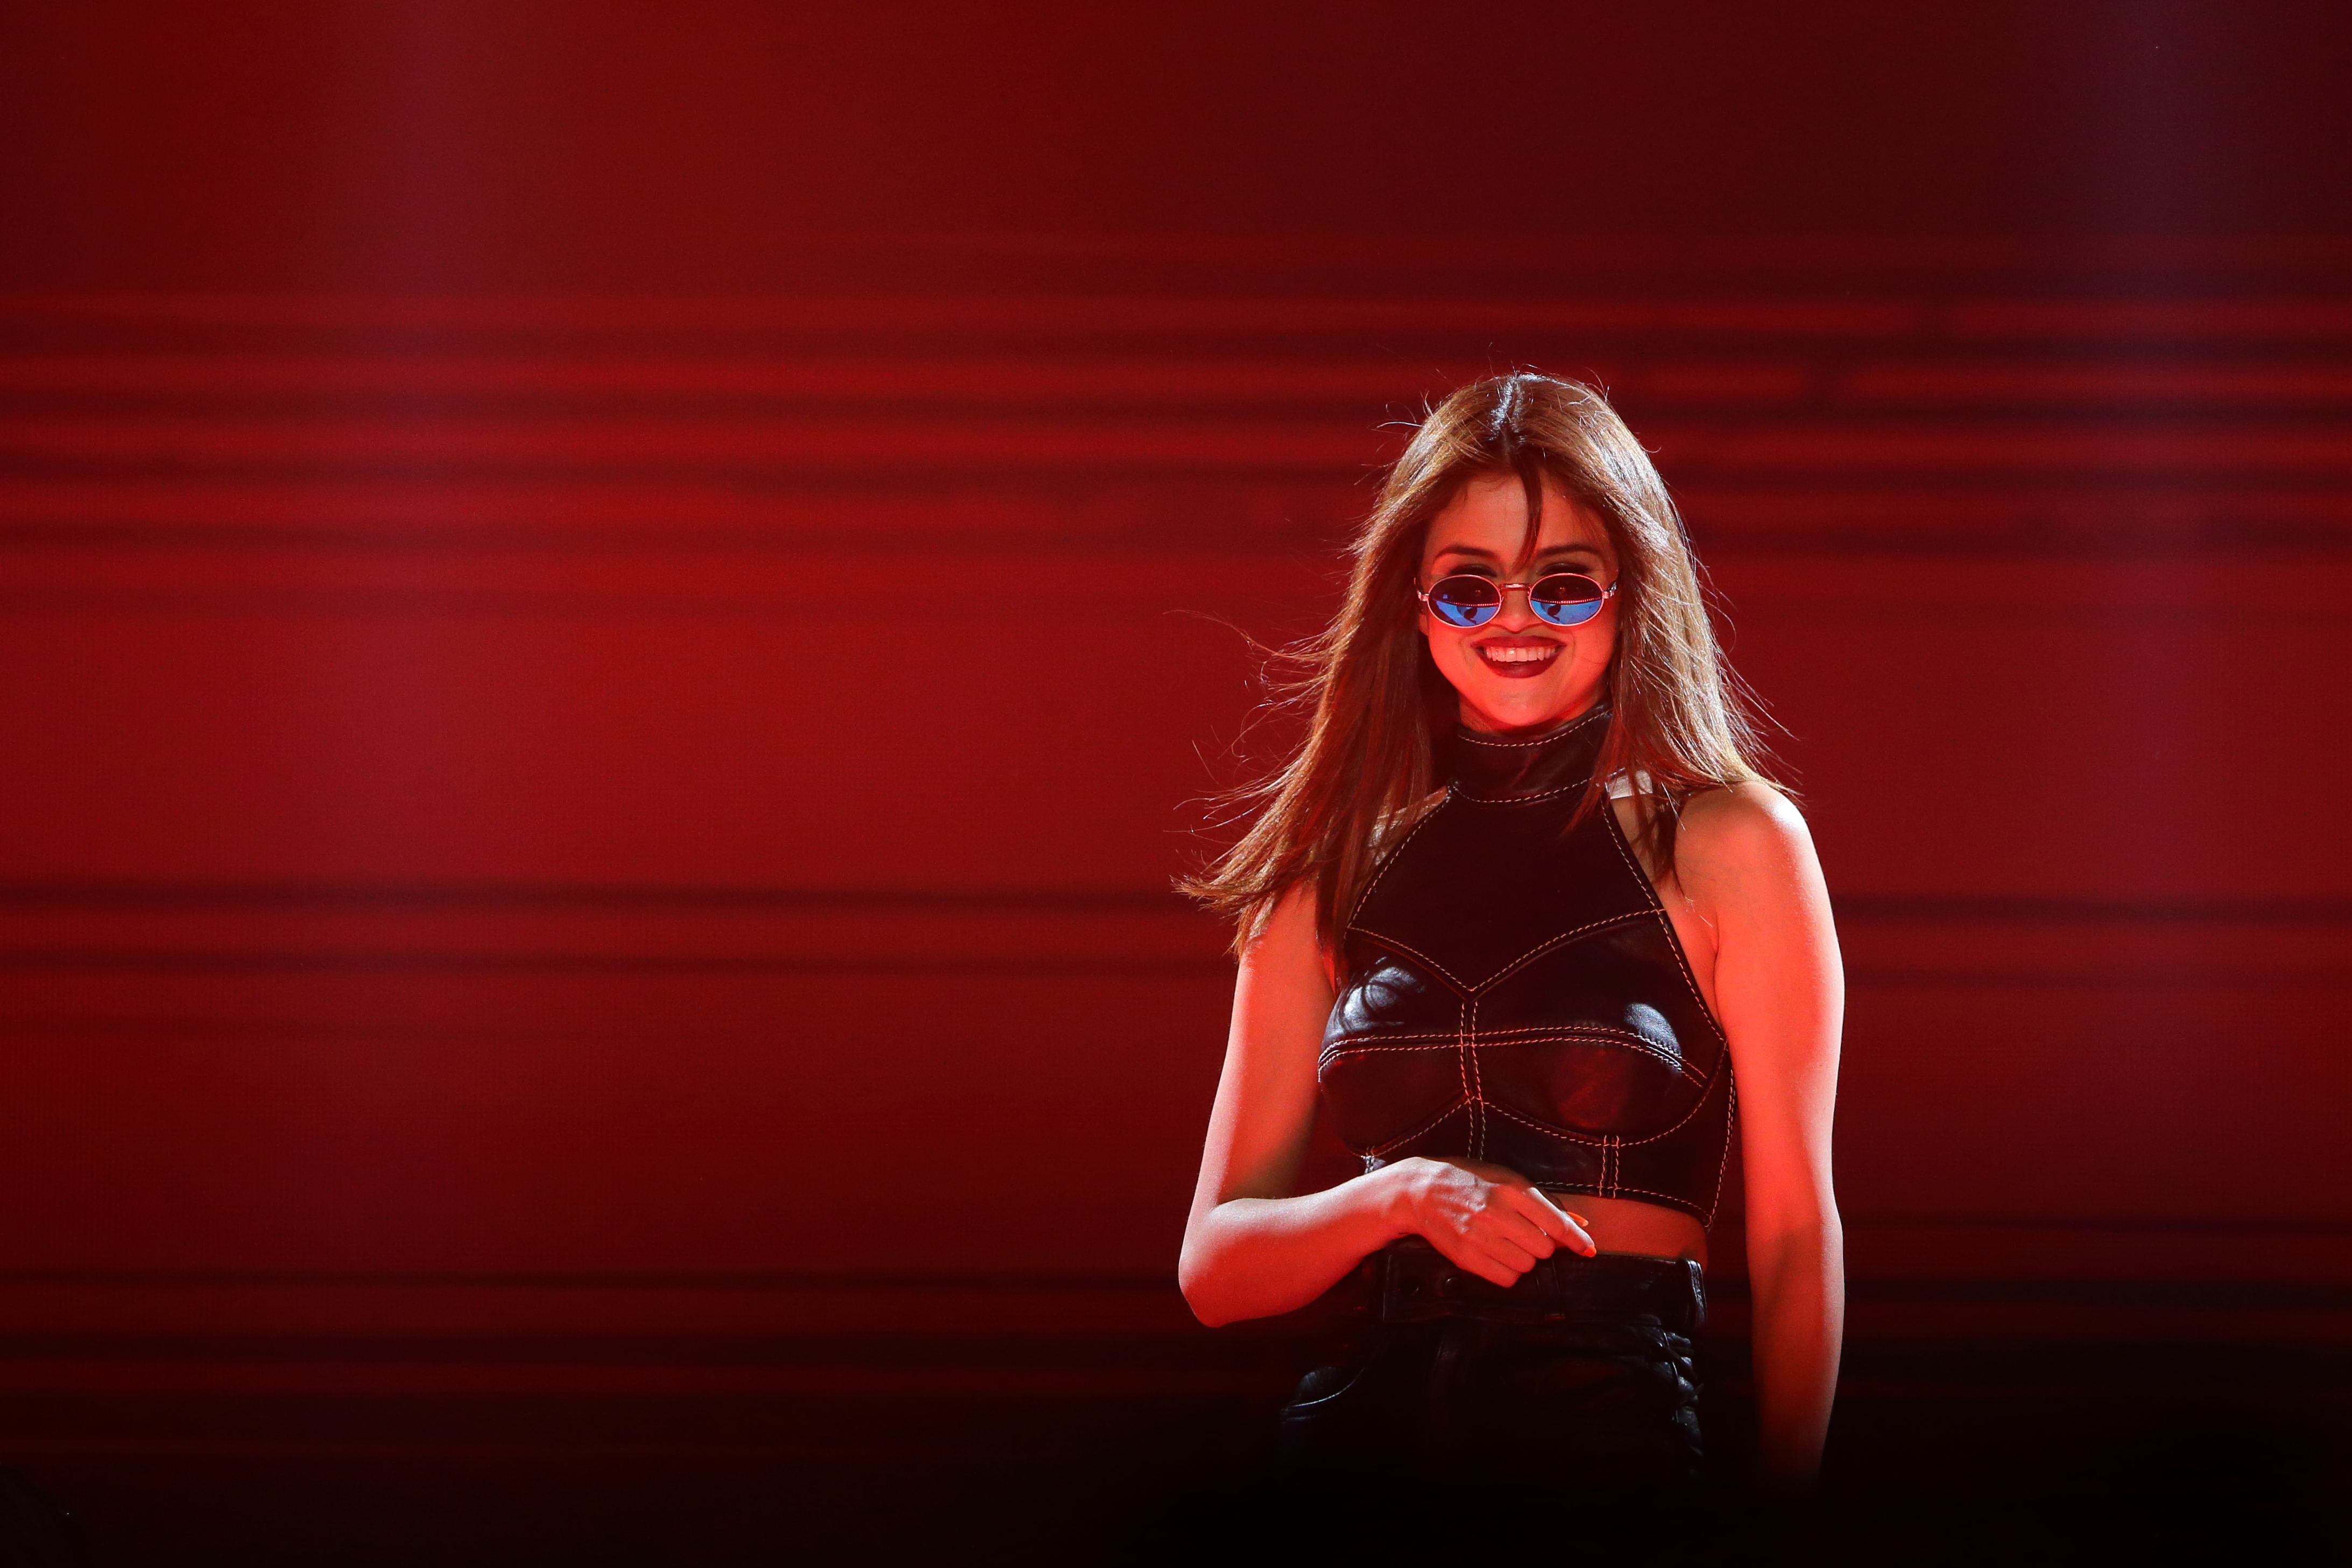 Selena Gomez 4k 2017, HD Music, 4k Wallpapers, Images ...